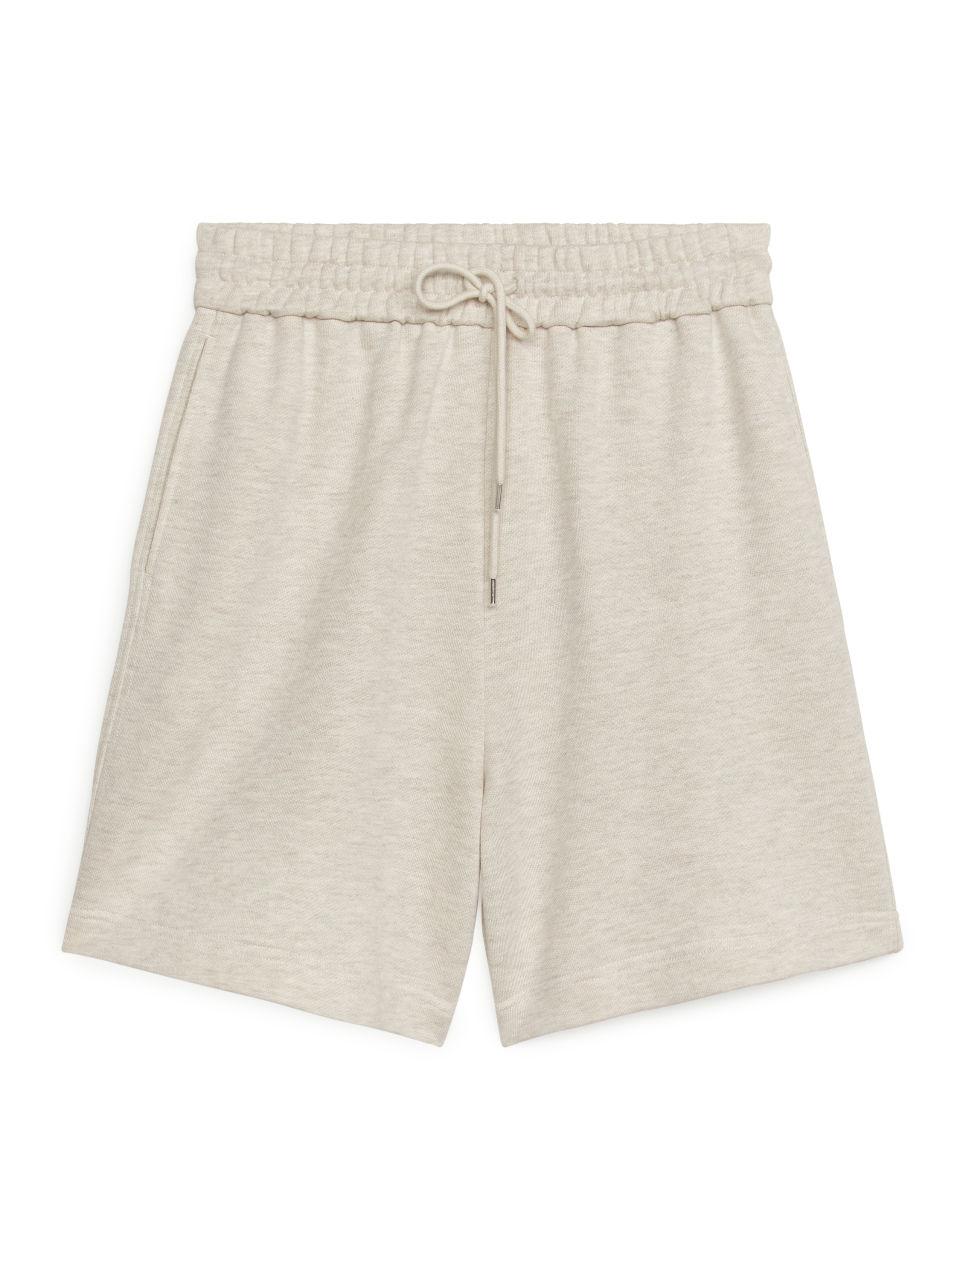 Lyocell Blend Shorts - Beige